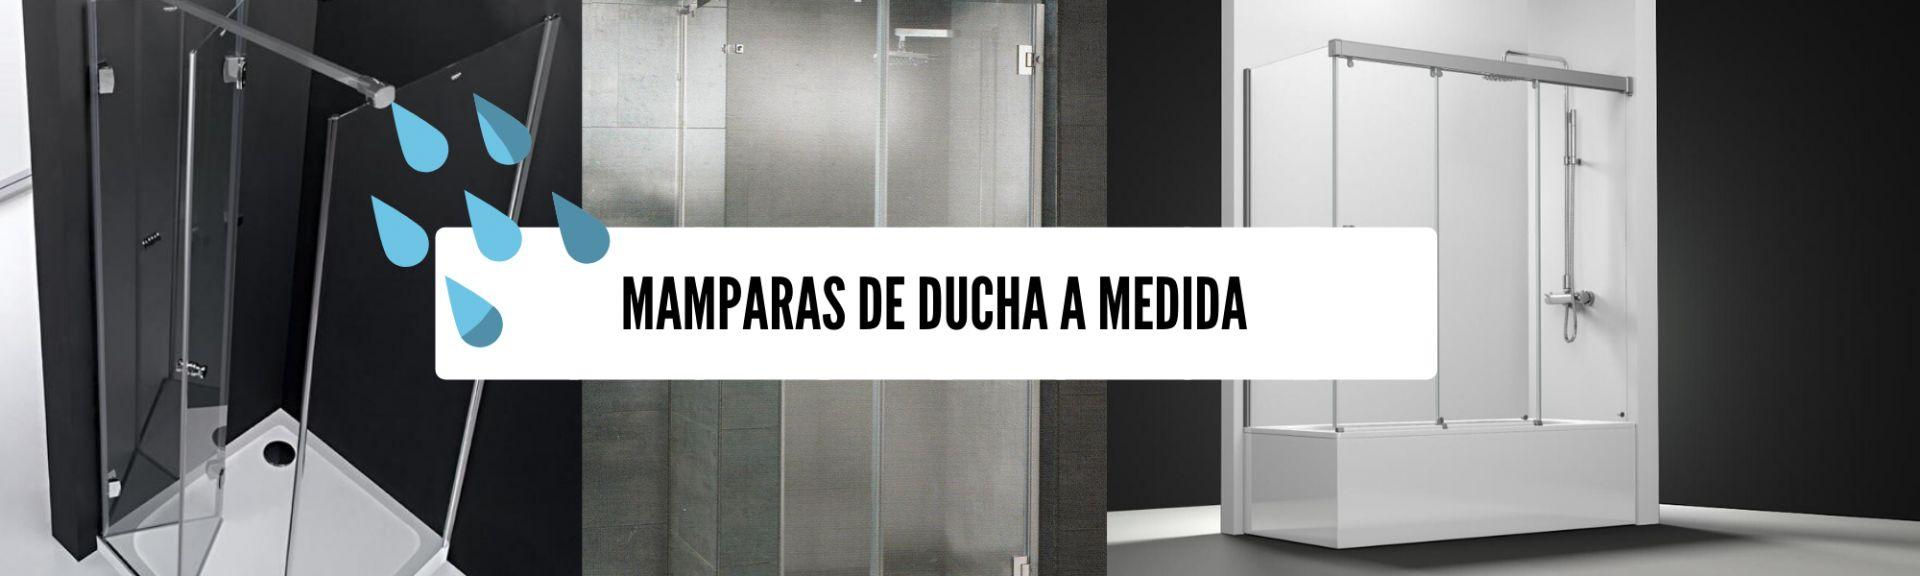 Mamparas De Ducha A Medida Online Mamparas Ofertas